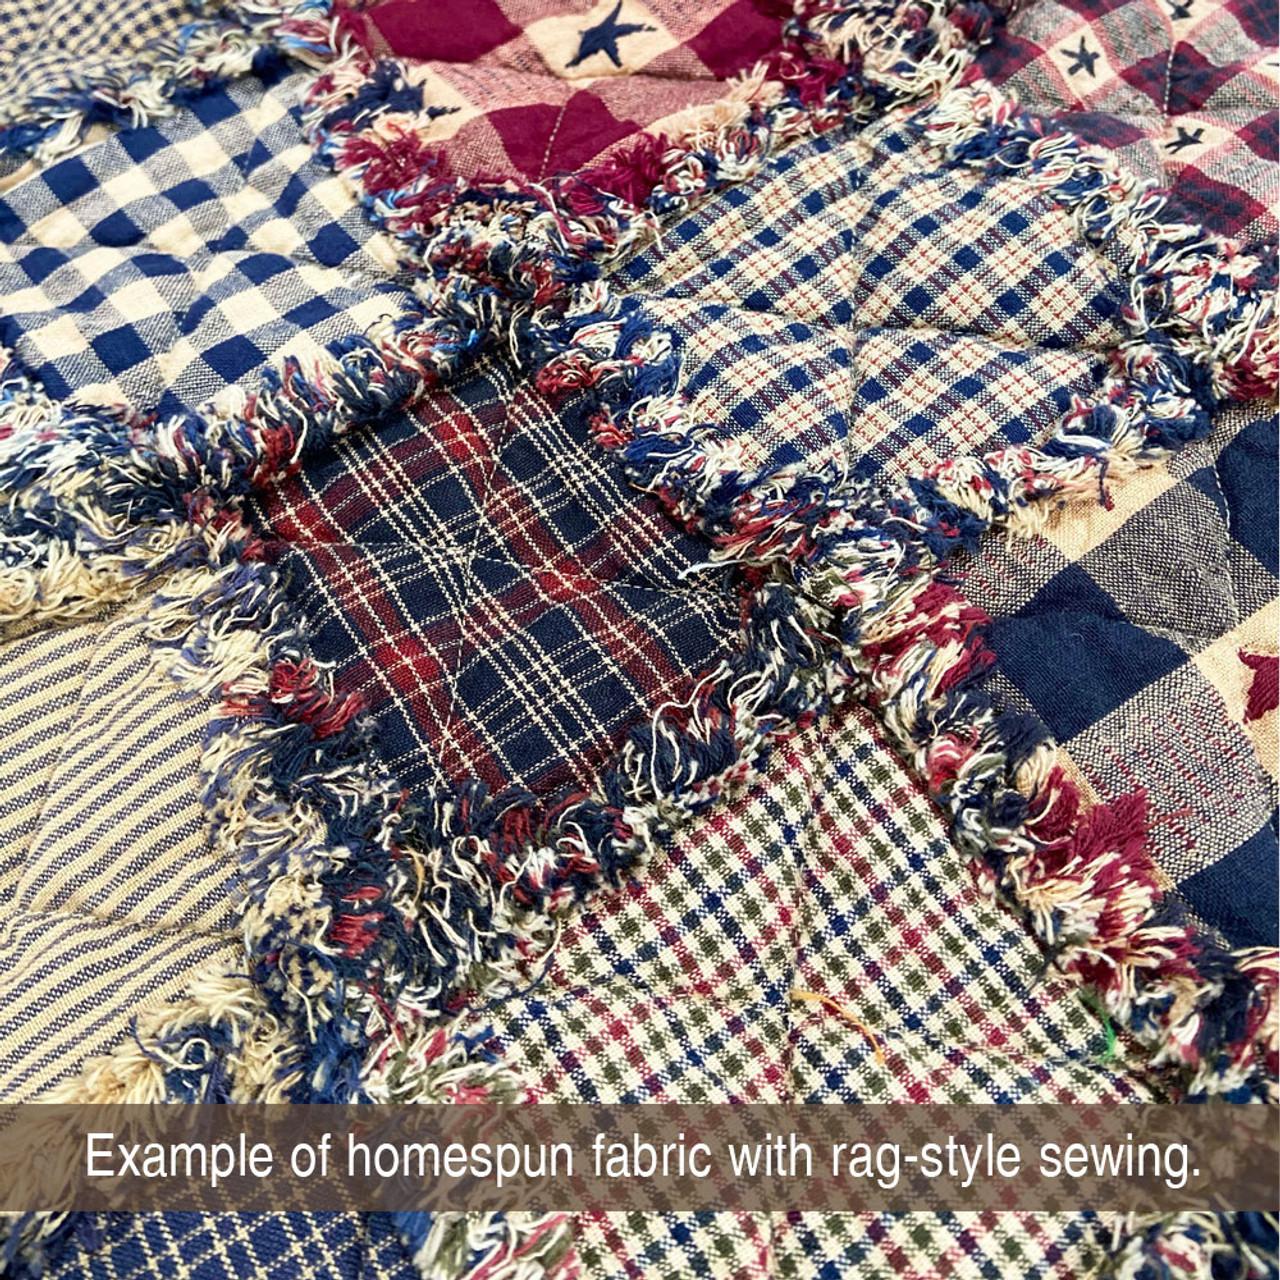 Homestead 2 Homespun Cotton Fabric